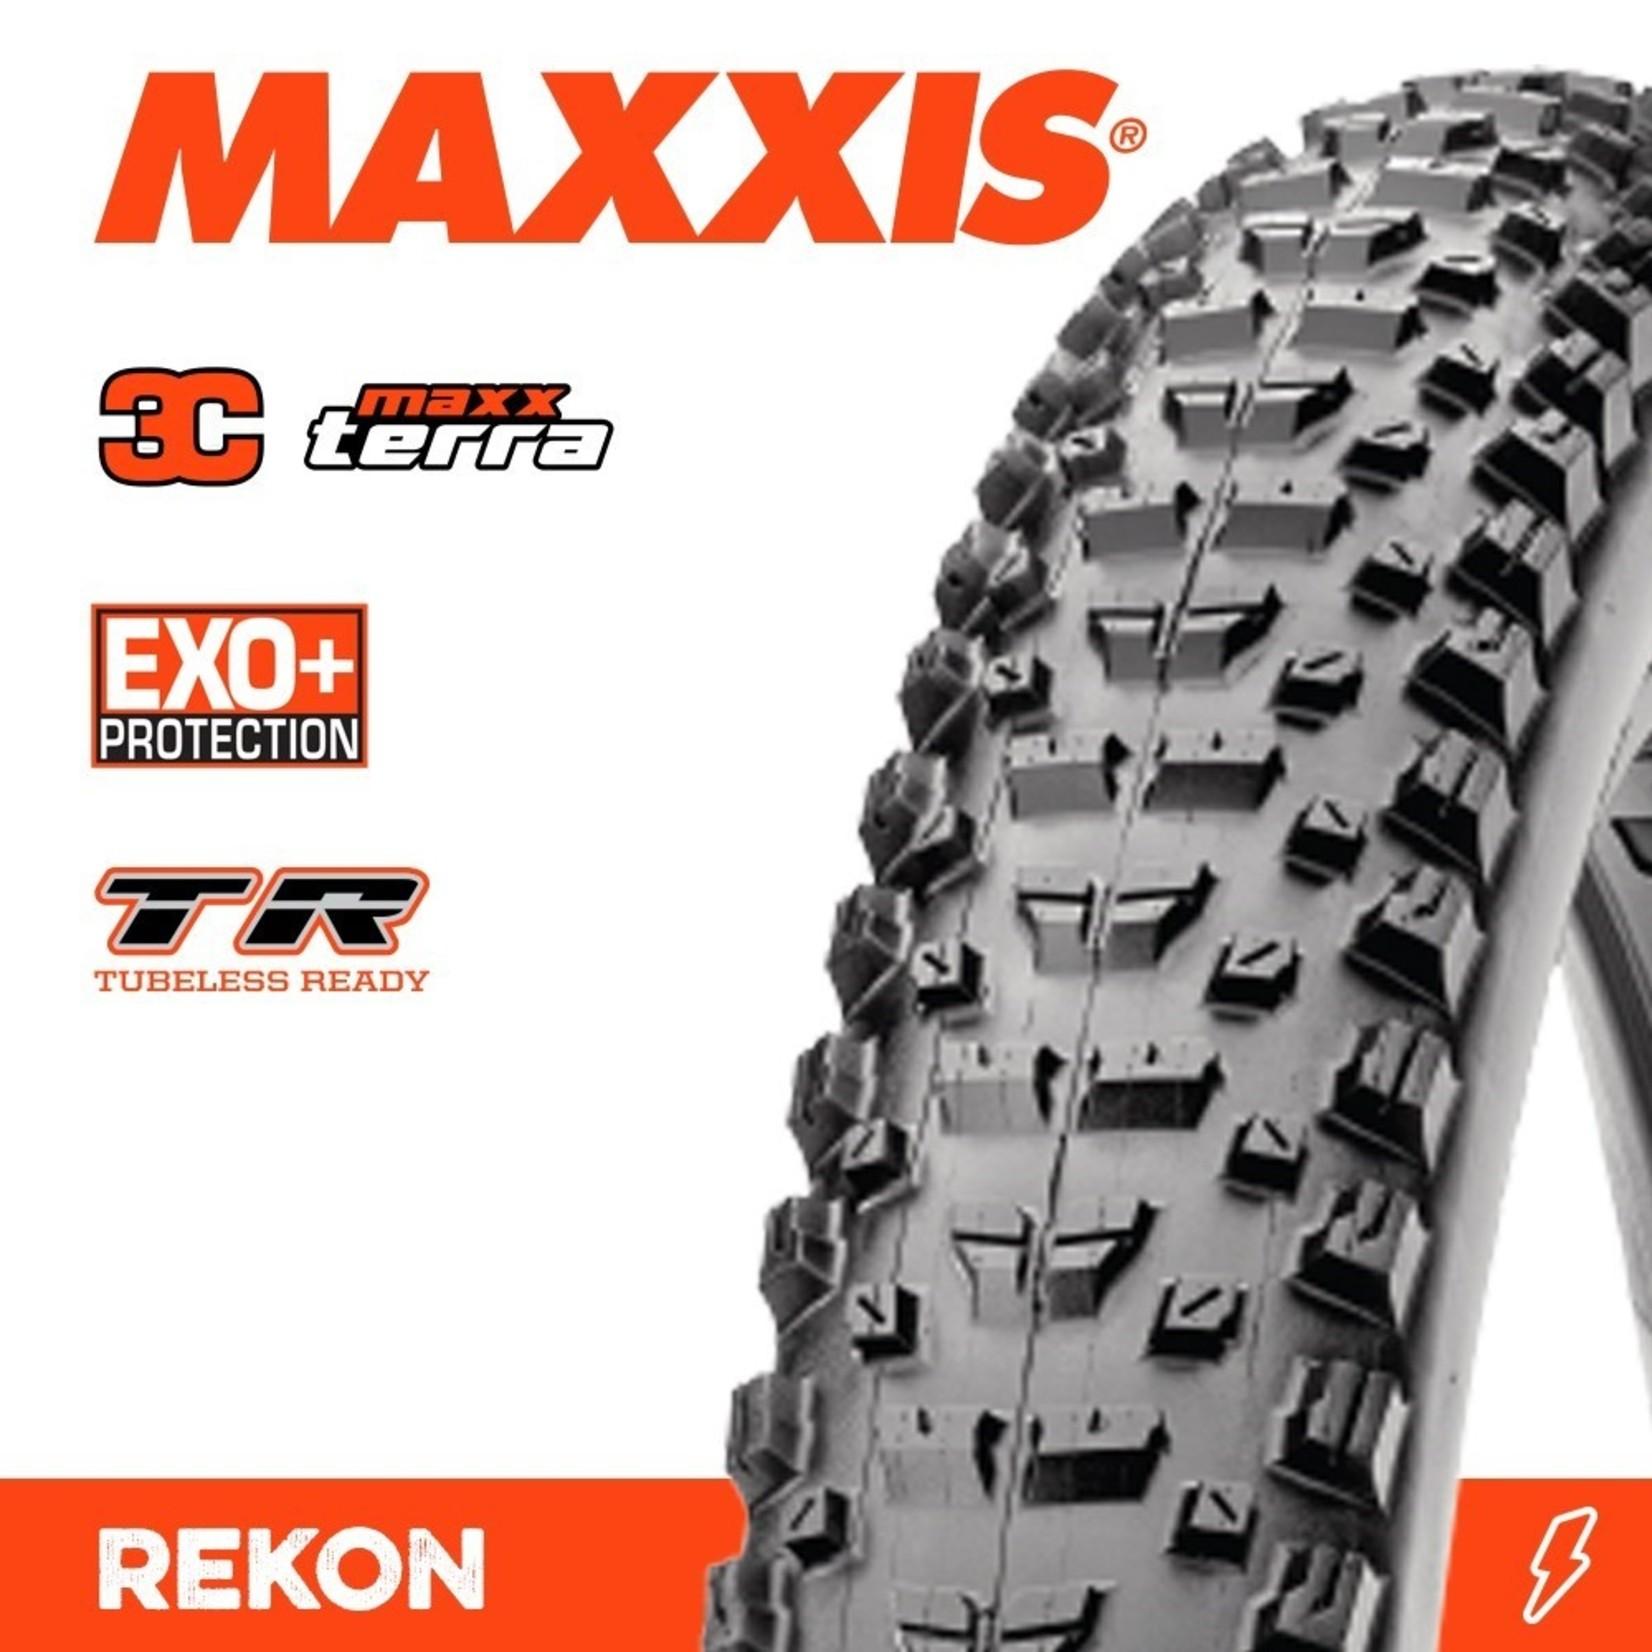 Maxxis Maxxis, Tyre Rekon + 27.5x2.80 Plus 3C Terra EXO+ TR 120TPI Black